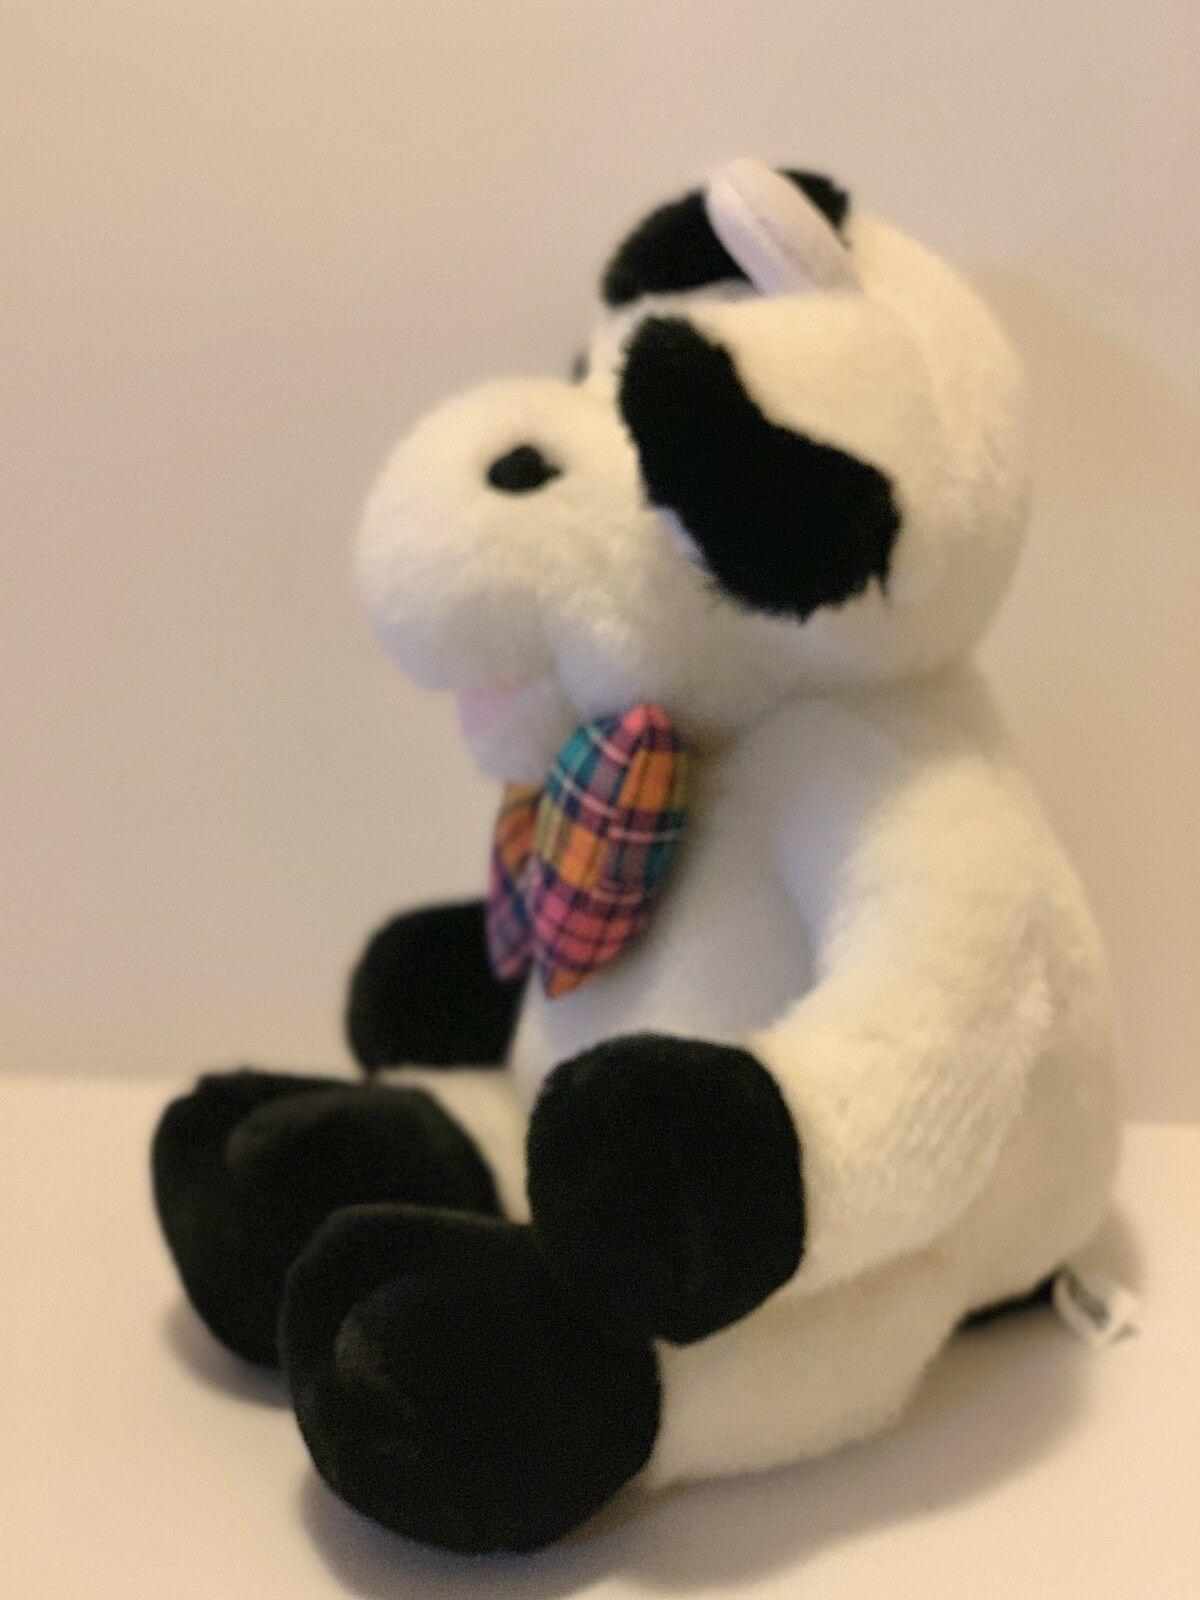 "Commonwealth Plush Cow Black White Stuffed Animal Plaid Bow Tie Soft 14"" Toy image 5"